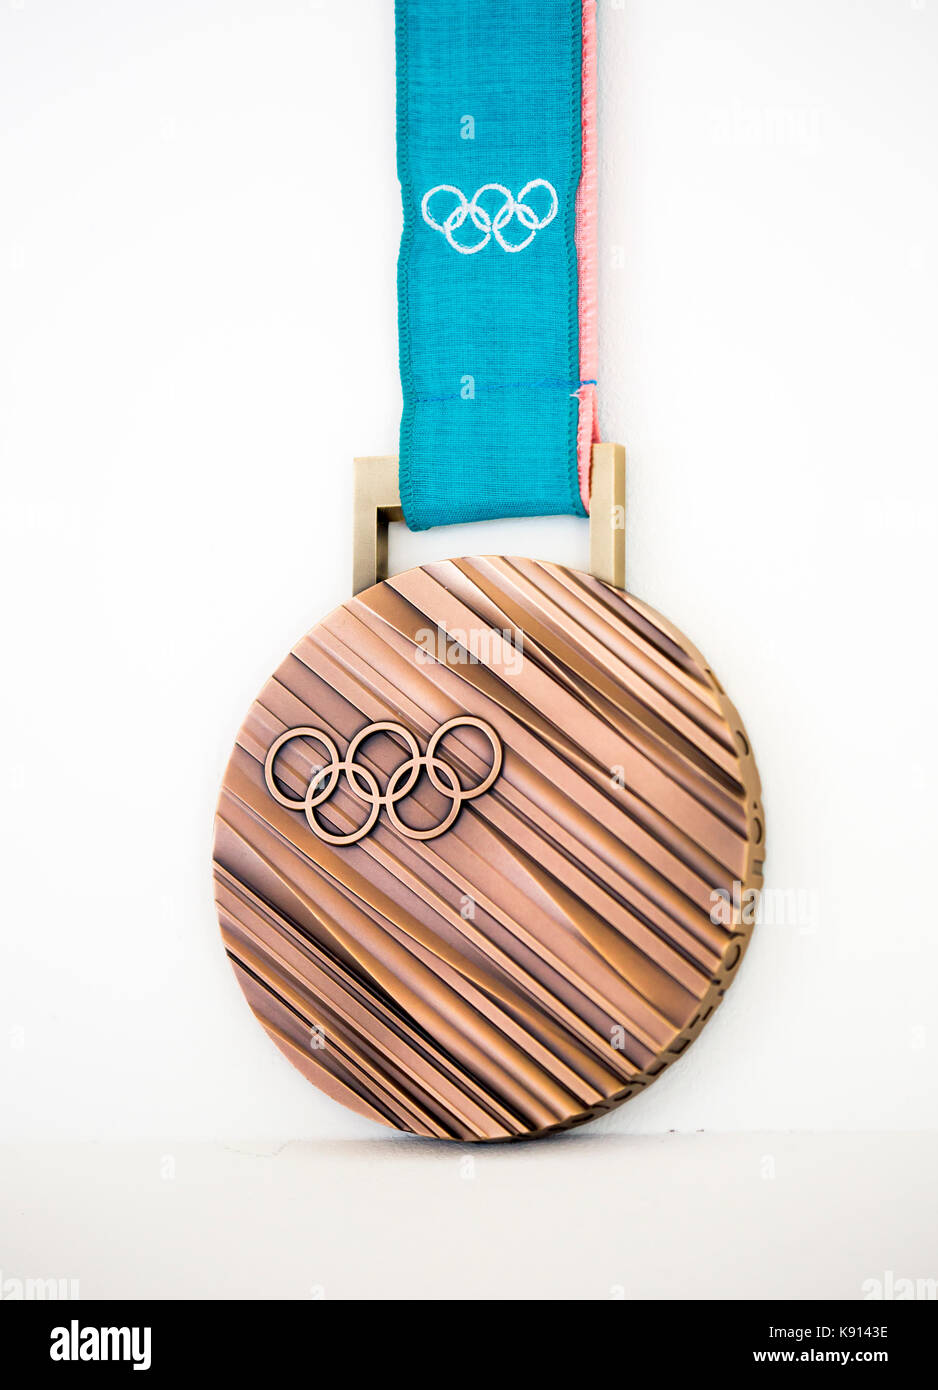 Seoul, South Korea. 21st Sep, 2017. Bronze medal of the 2018 PyeongChang Winter Olympics, Sep 21, 2017 : A bronze - Stock Image